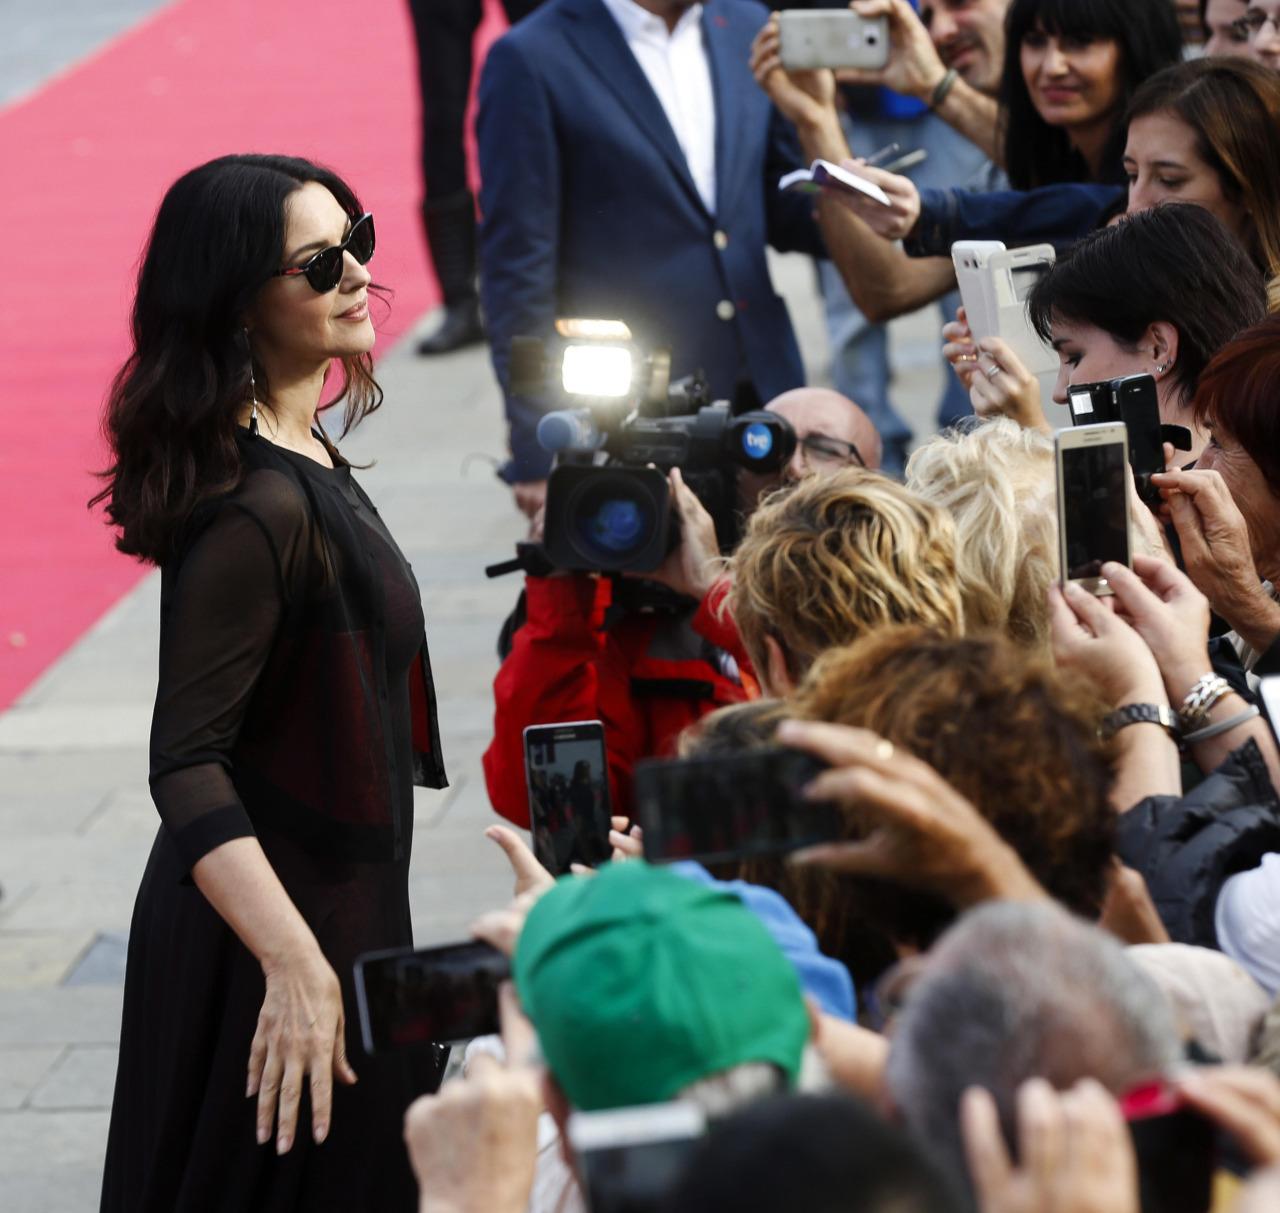 Full HQ Photos of Italian actress Monica Bellucci at 64th San Sebastian International Film Festival